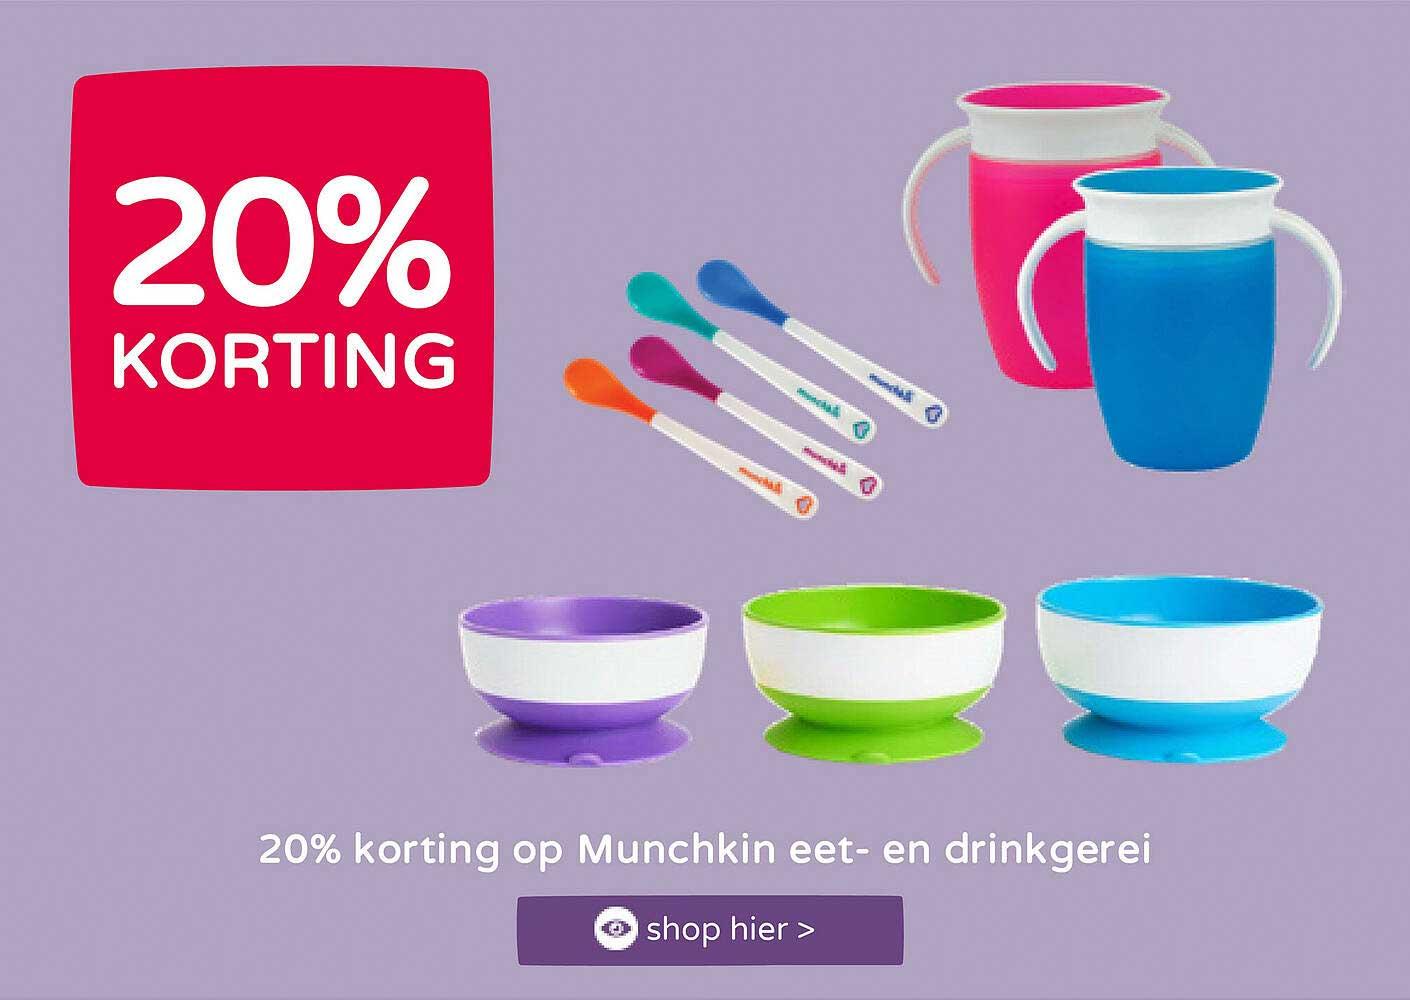 Prénatal 20% Korting Op Munchkin Eet- En Drinkgerei